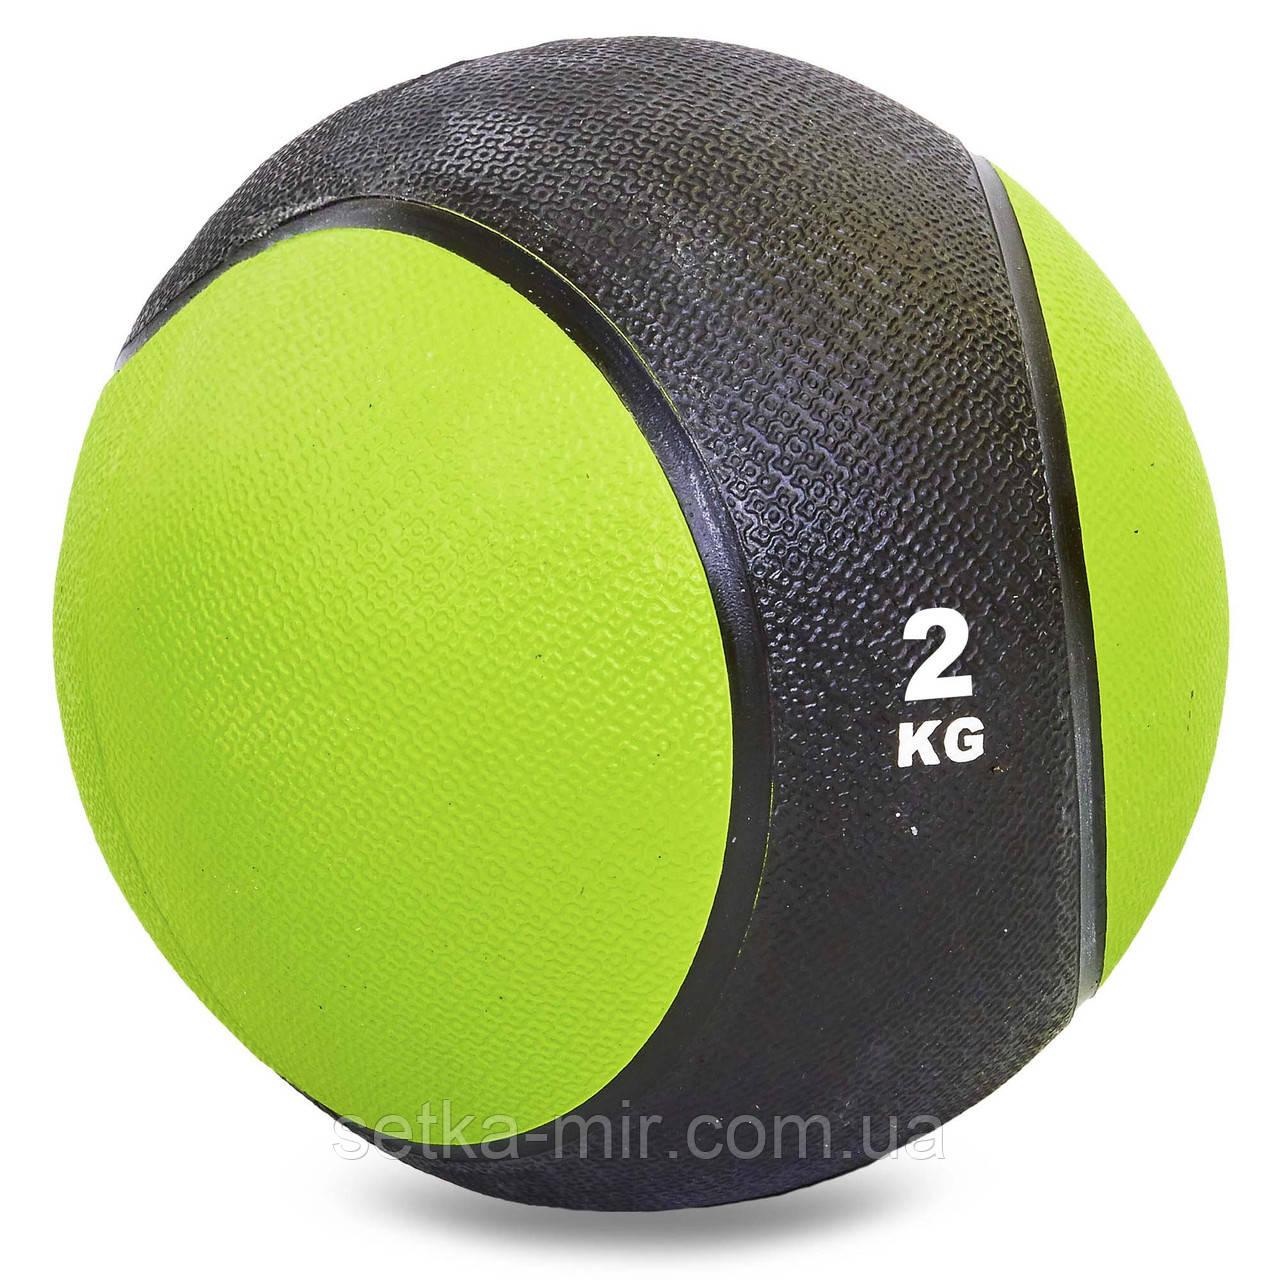 М'яч медичний медбол Record Medicine Ball C-2660-2 2 кг